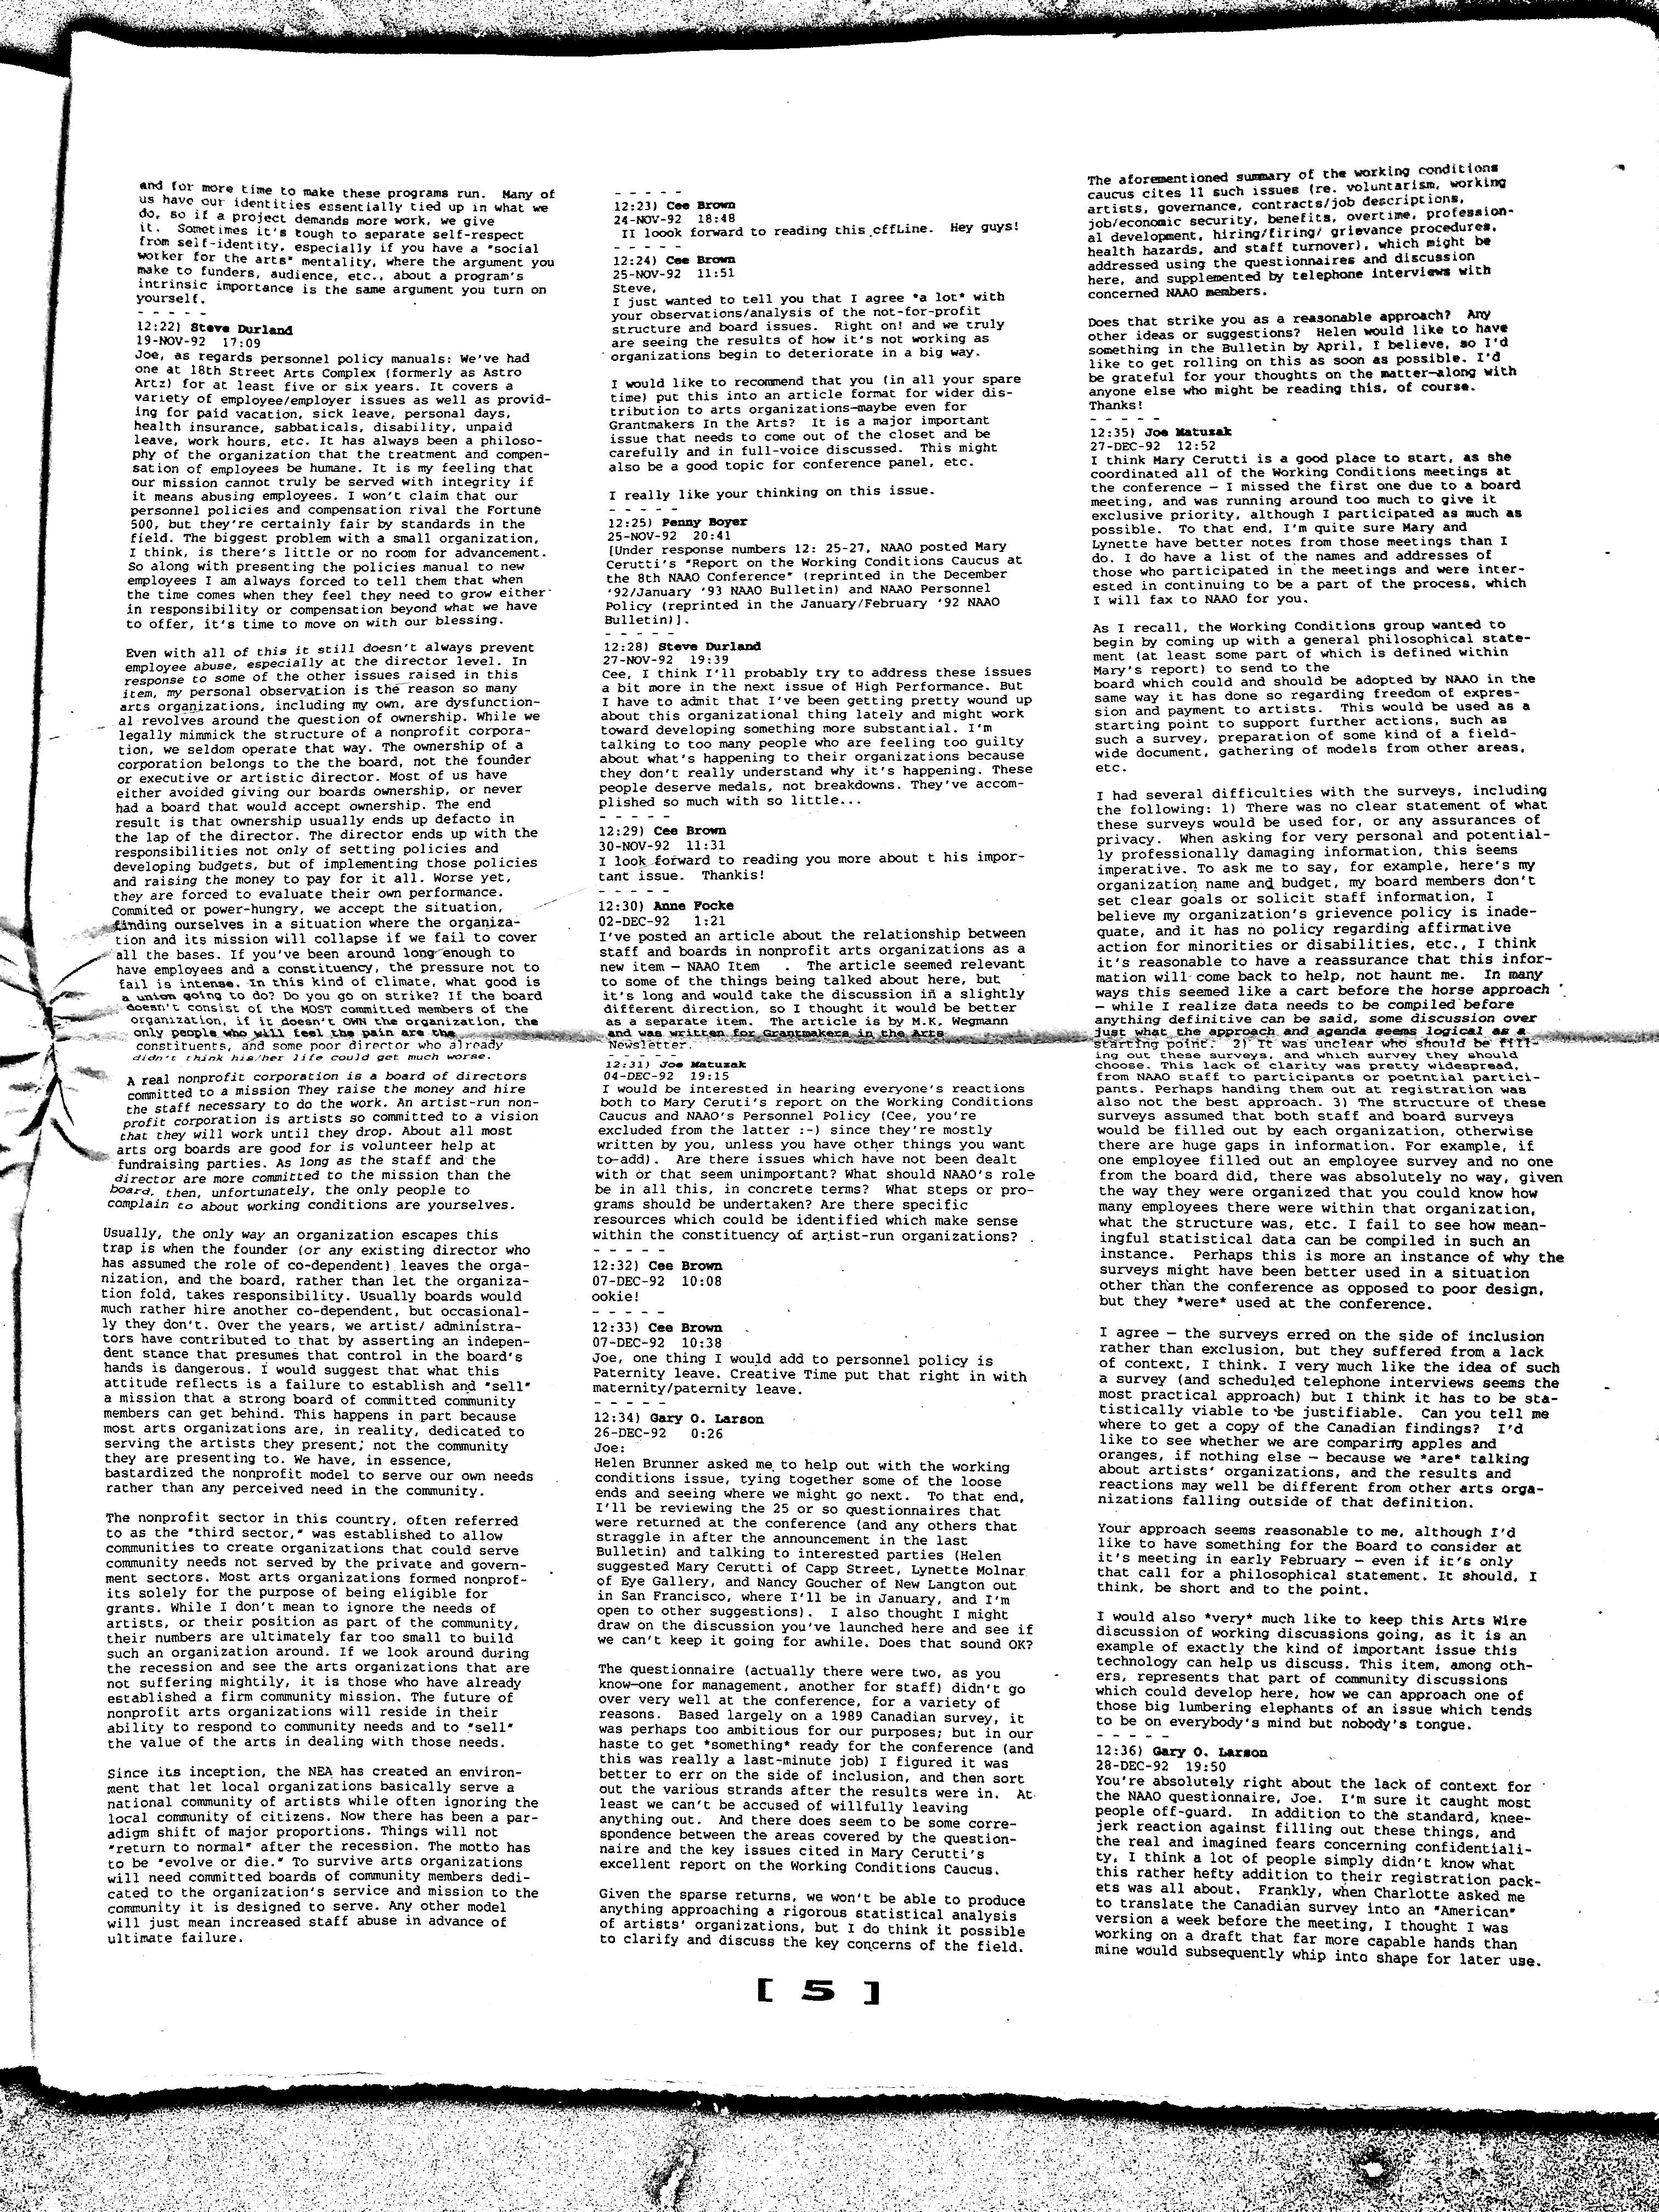 April 1993 - NAAO Bulletin Page 5.jpg